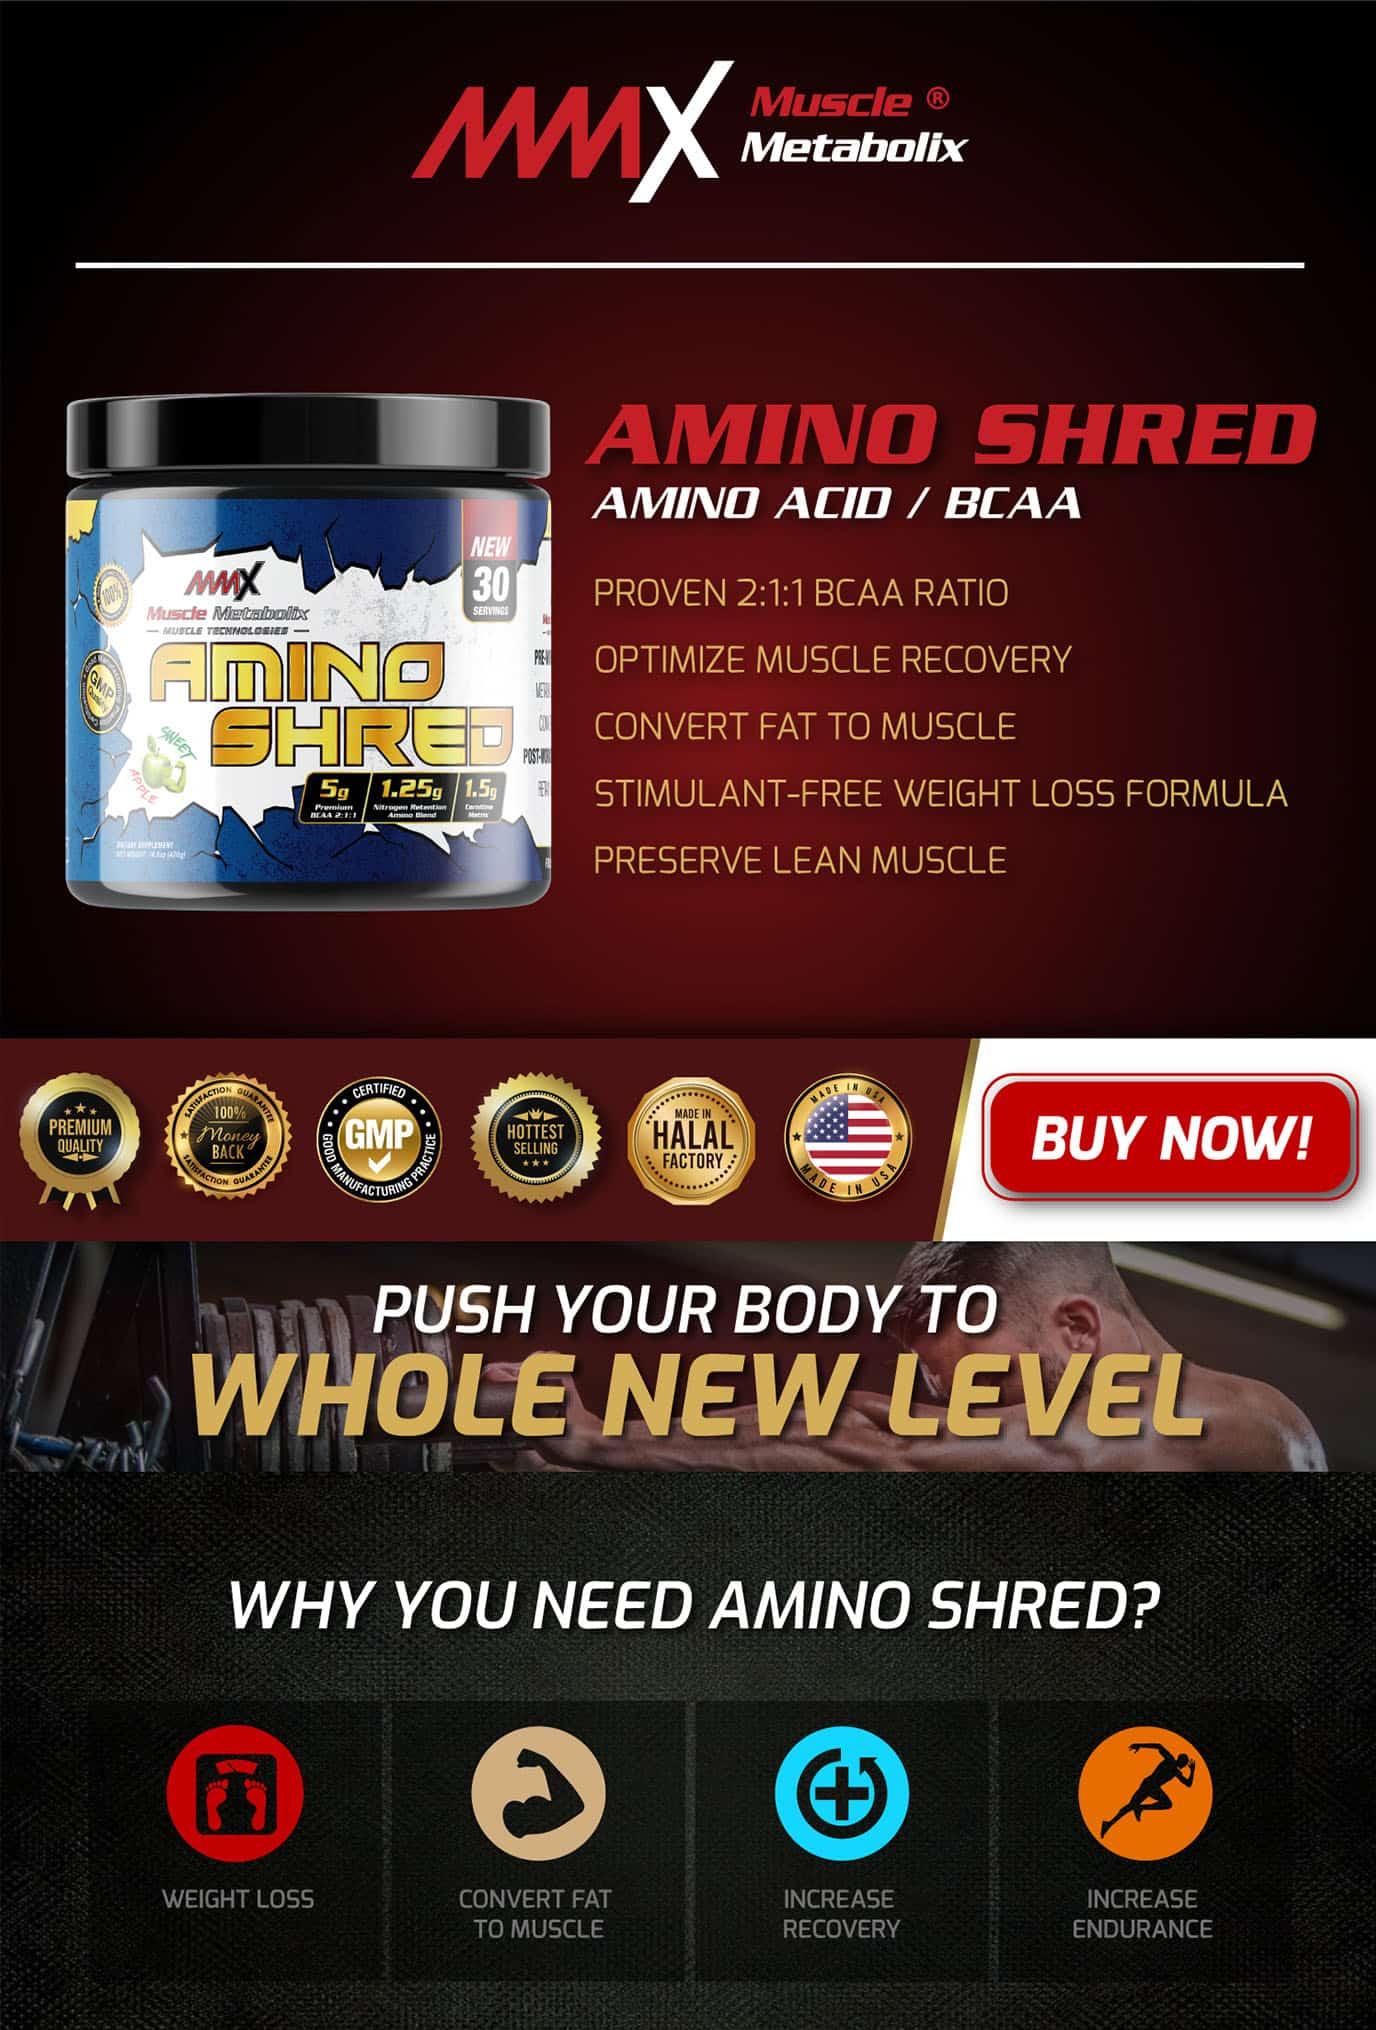 MMX Amino Shred, muscle, burn fat, kurus, slim, thin, body builder, gym, nutrition pro, supplement, sihat, improve energy, gymnast, cyclist, BCAA, kuat tiger, kuasa kuda, amino acid, sado